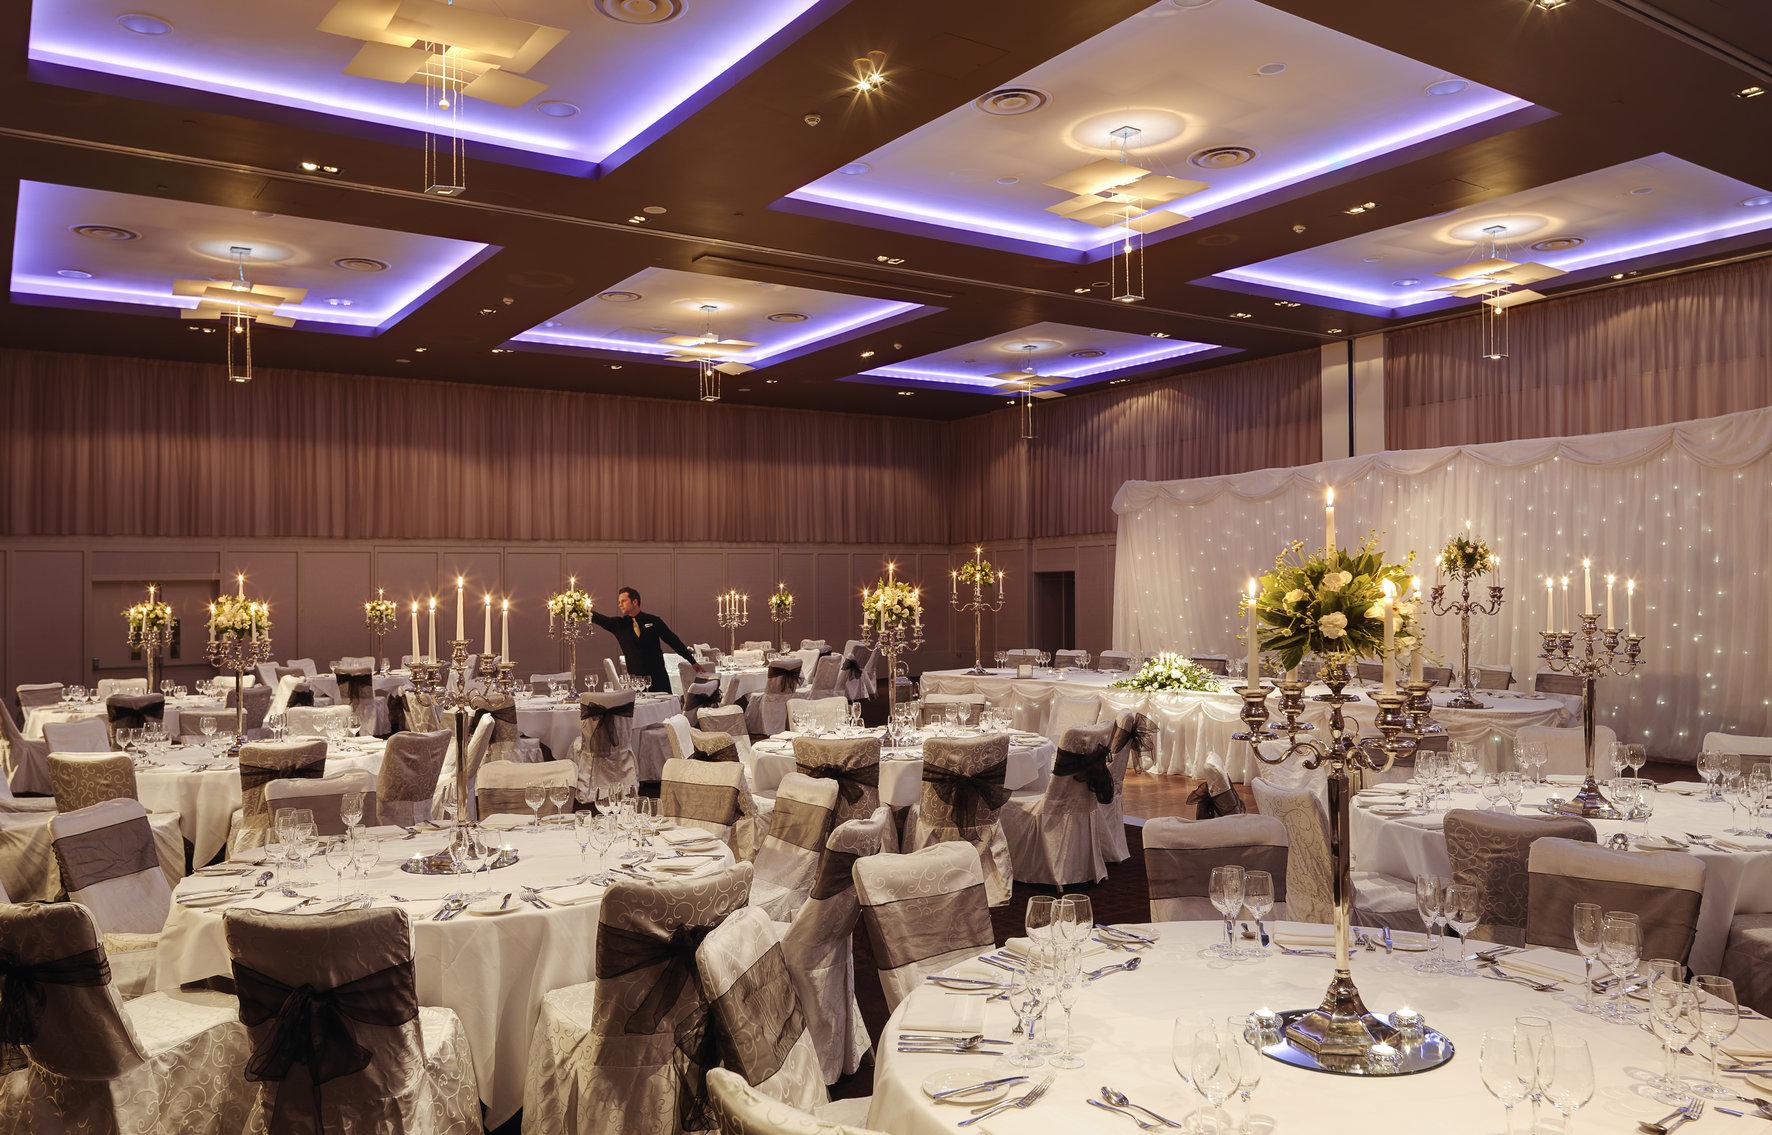 Limerick Strand Hotel Wedding Open Day 2016